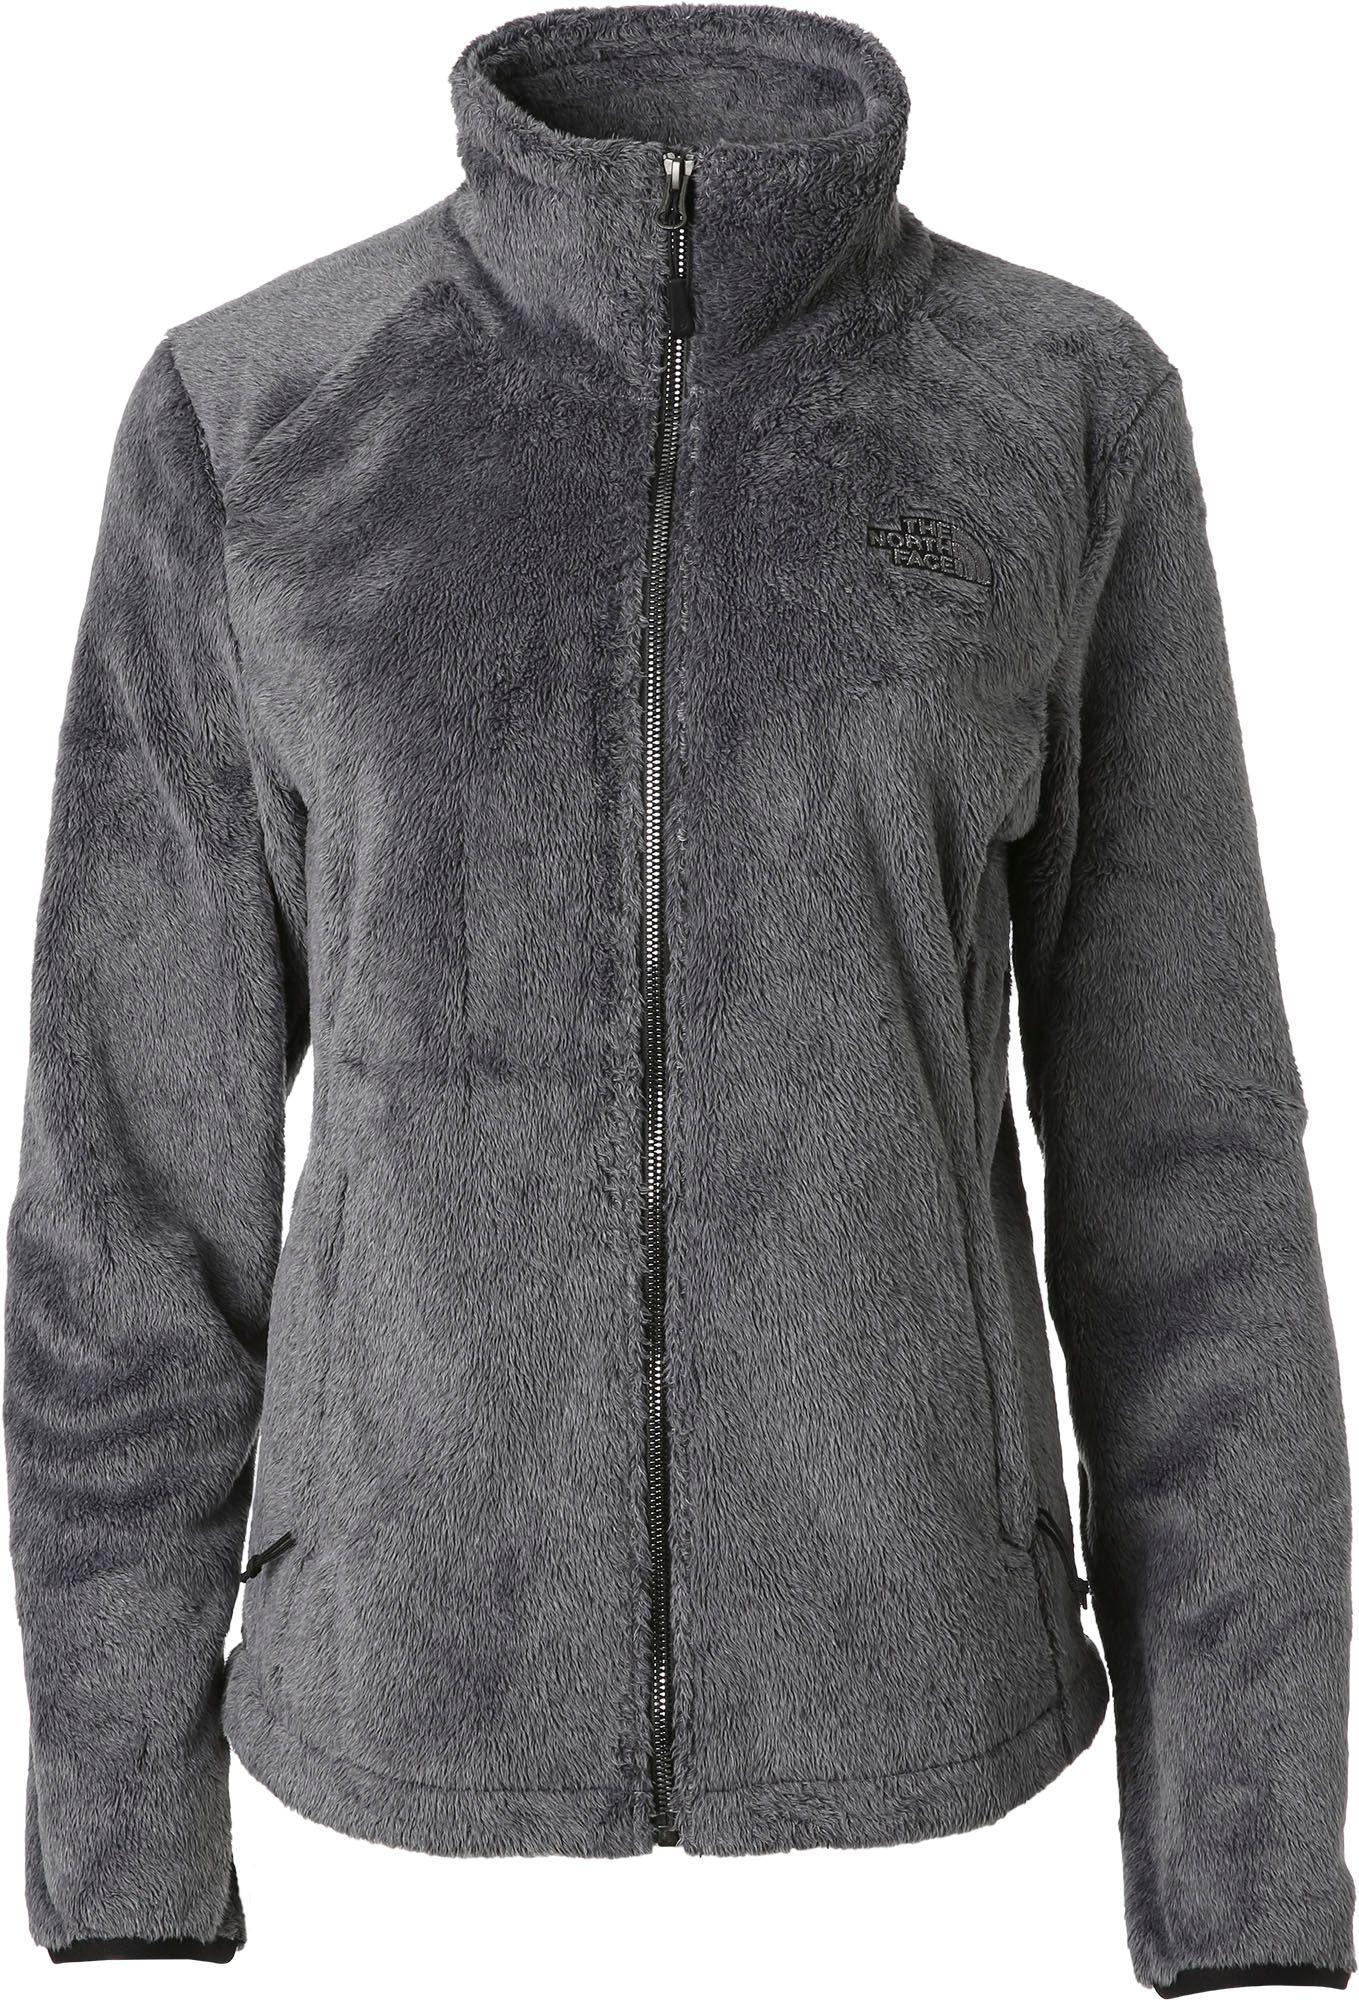 The north face osito 2 fleece jacket black